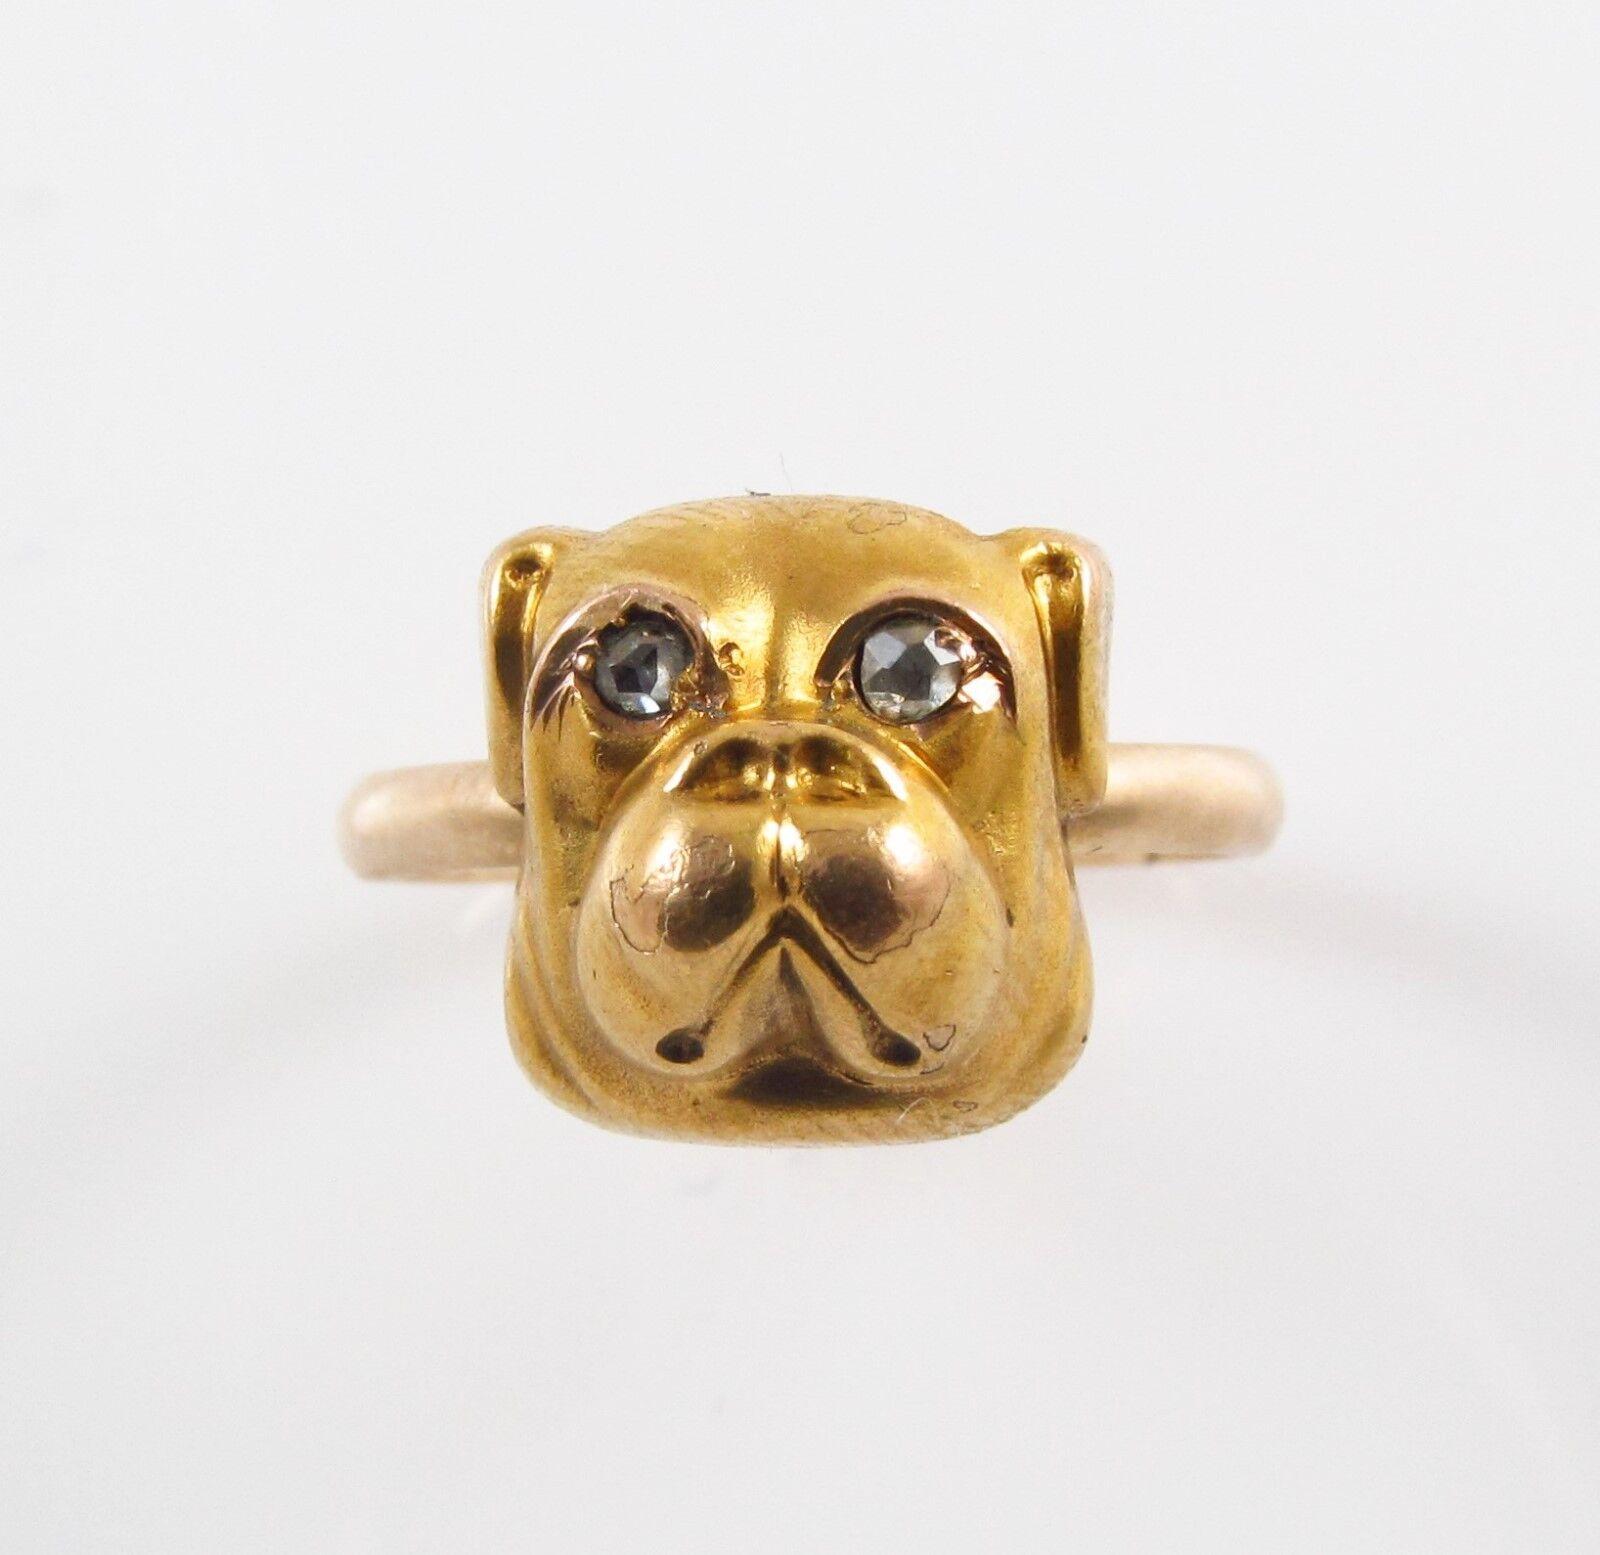 14k gold Victorian Art Nouveau Diamond Eyed Bulldog Conversion Ring Size 6